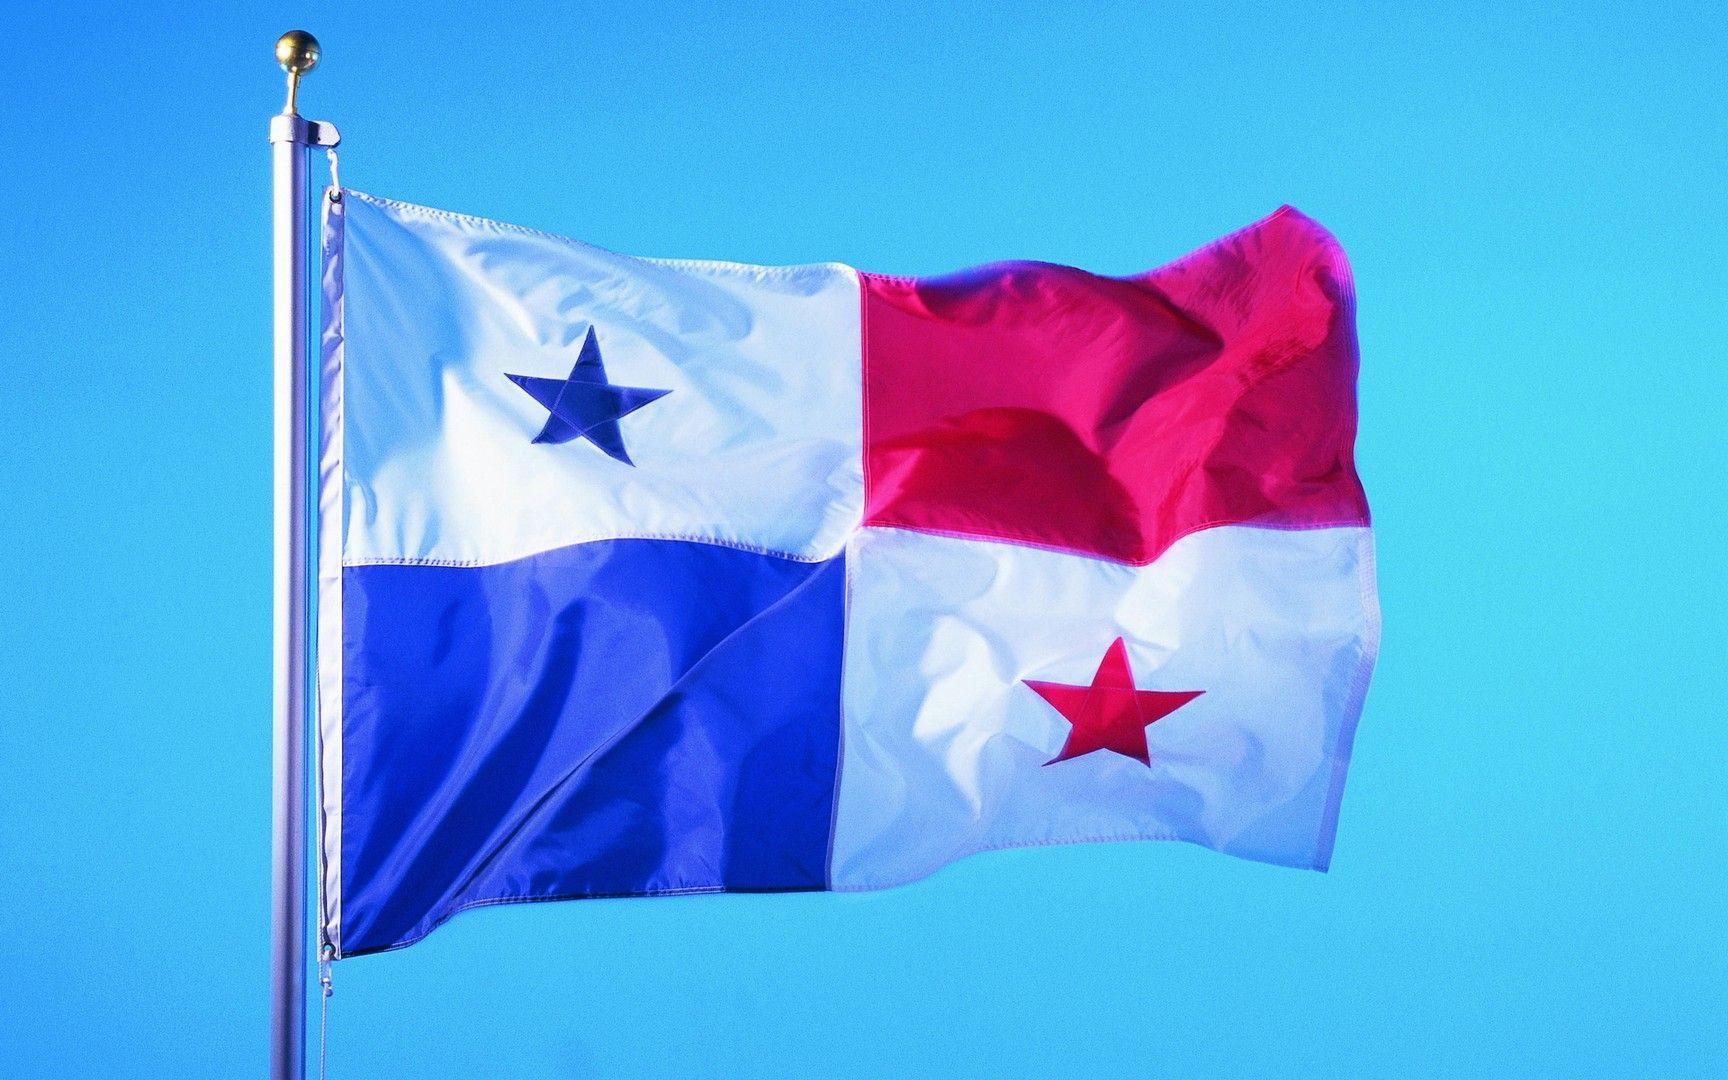 Panama Flag Wallpaper Flags Wallpaper Pinterest Panama And Flags - Panama flag